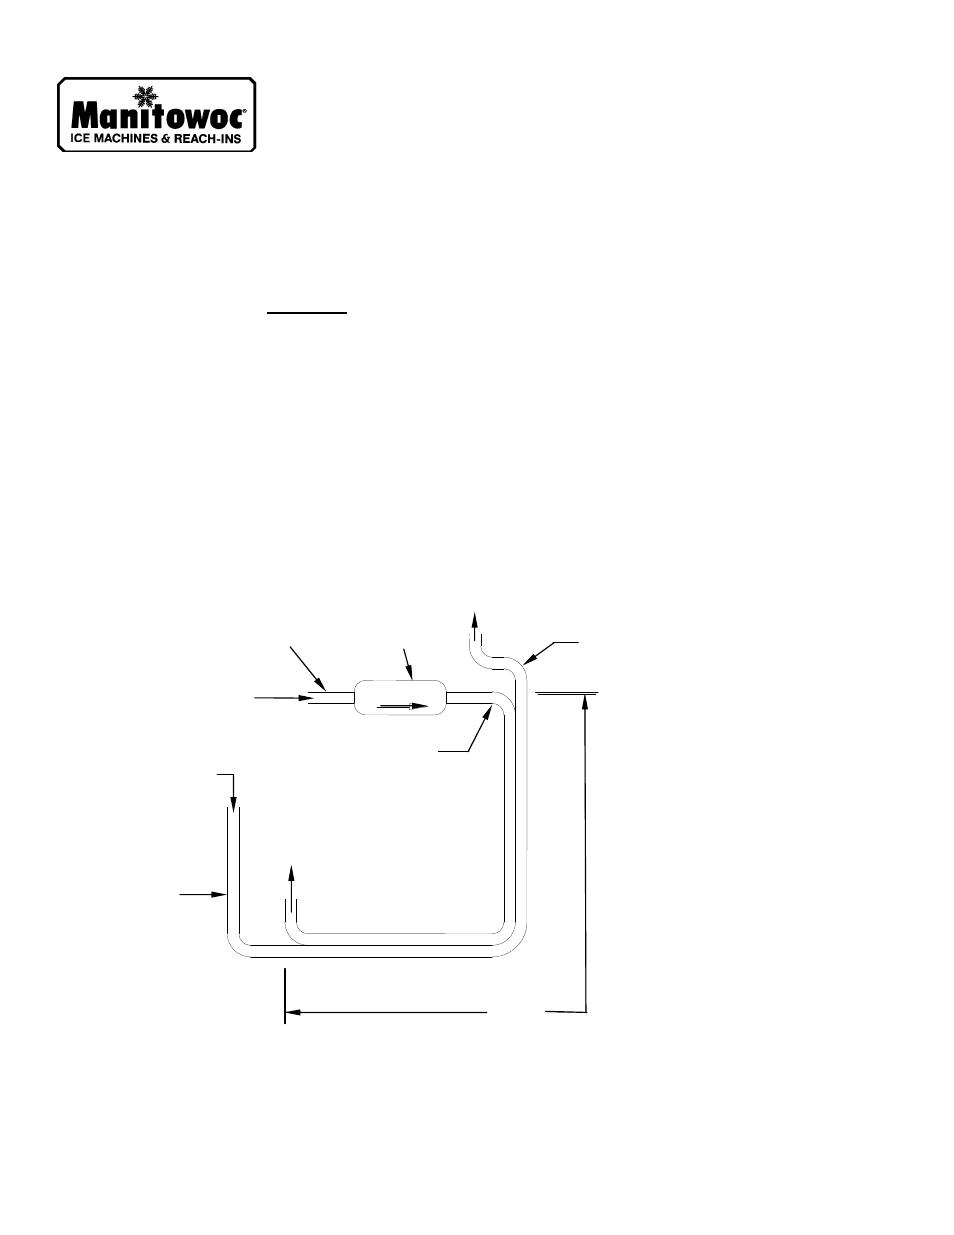 Manitowoc Evaporator Coil Pr204lop Wiring Diagram   Wiring Liry on